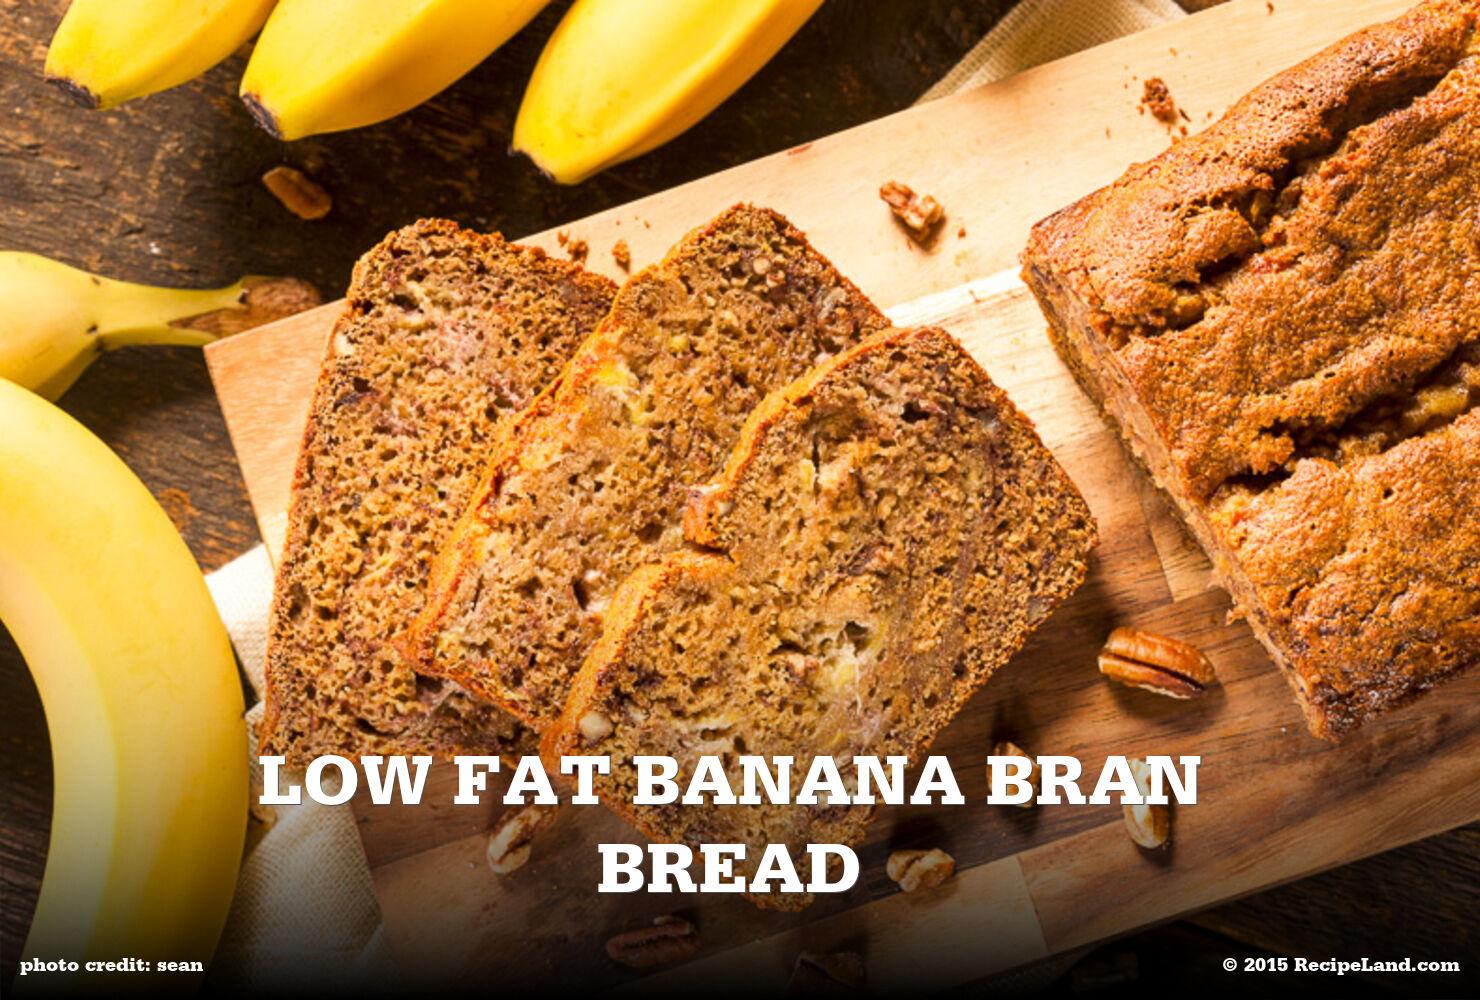 Low Fat Banana Bran Bread